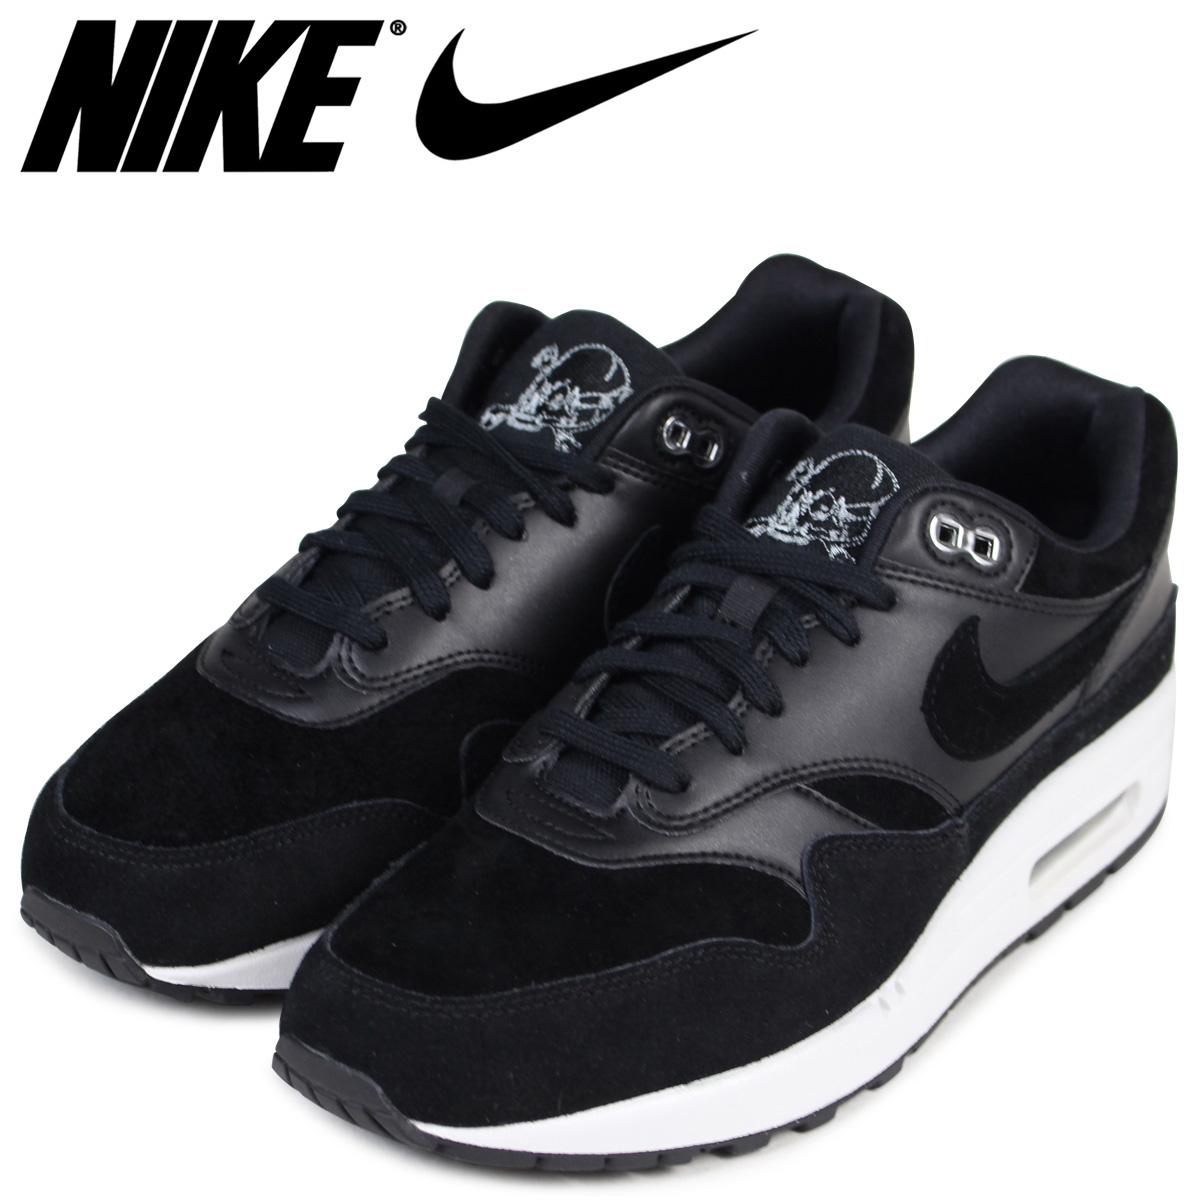 7e3fde9e44059 Sugar Online Shop: NIKE Kie Ney AMAX 1 premium sneakers AIR MAX 1 PRMEIUM  875,844-001 men's shoes black black | Rakuten Global Market